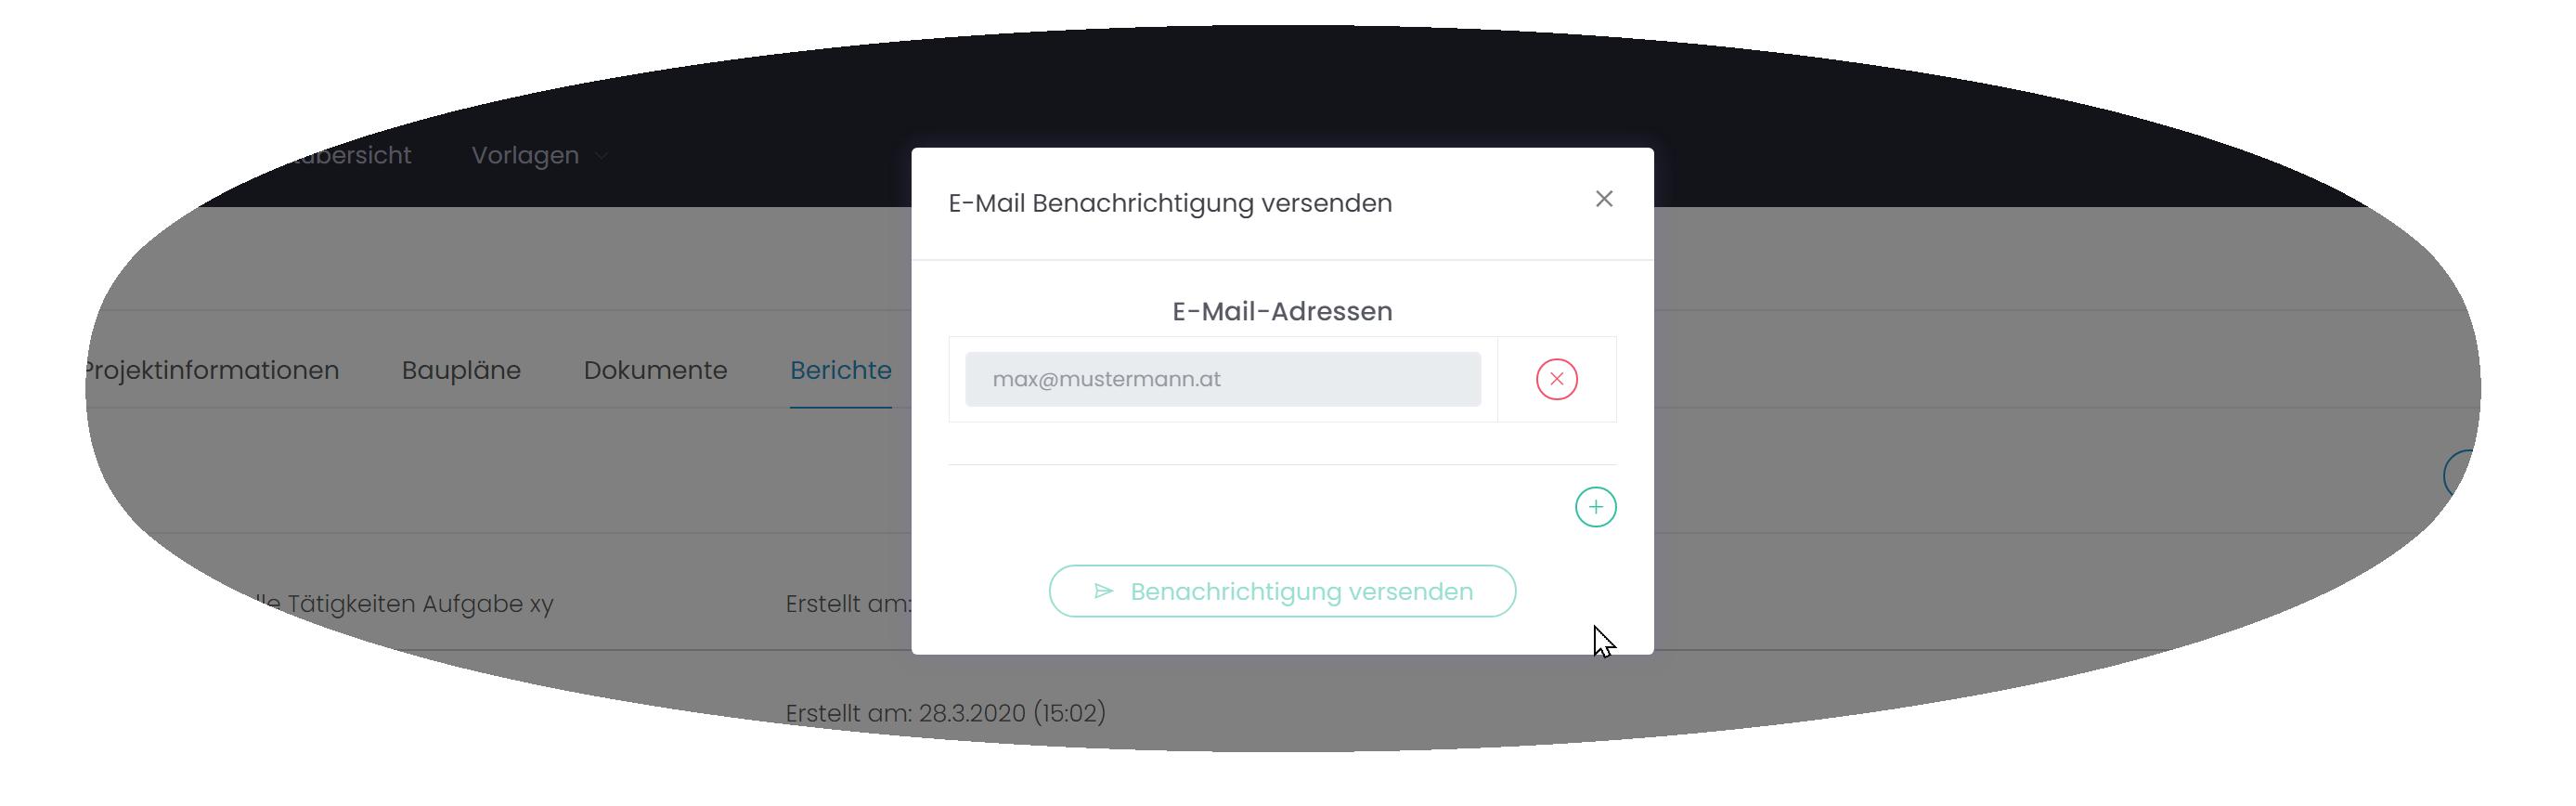 DokuPit Bericht als E-Mail senden